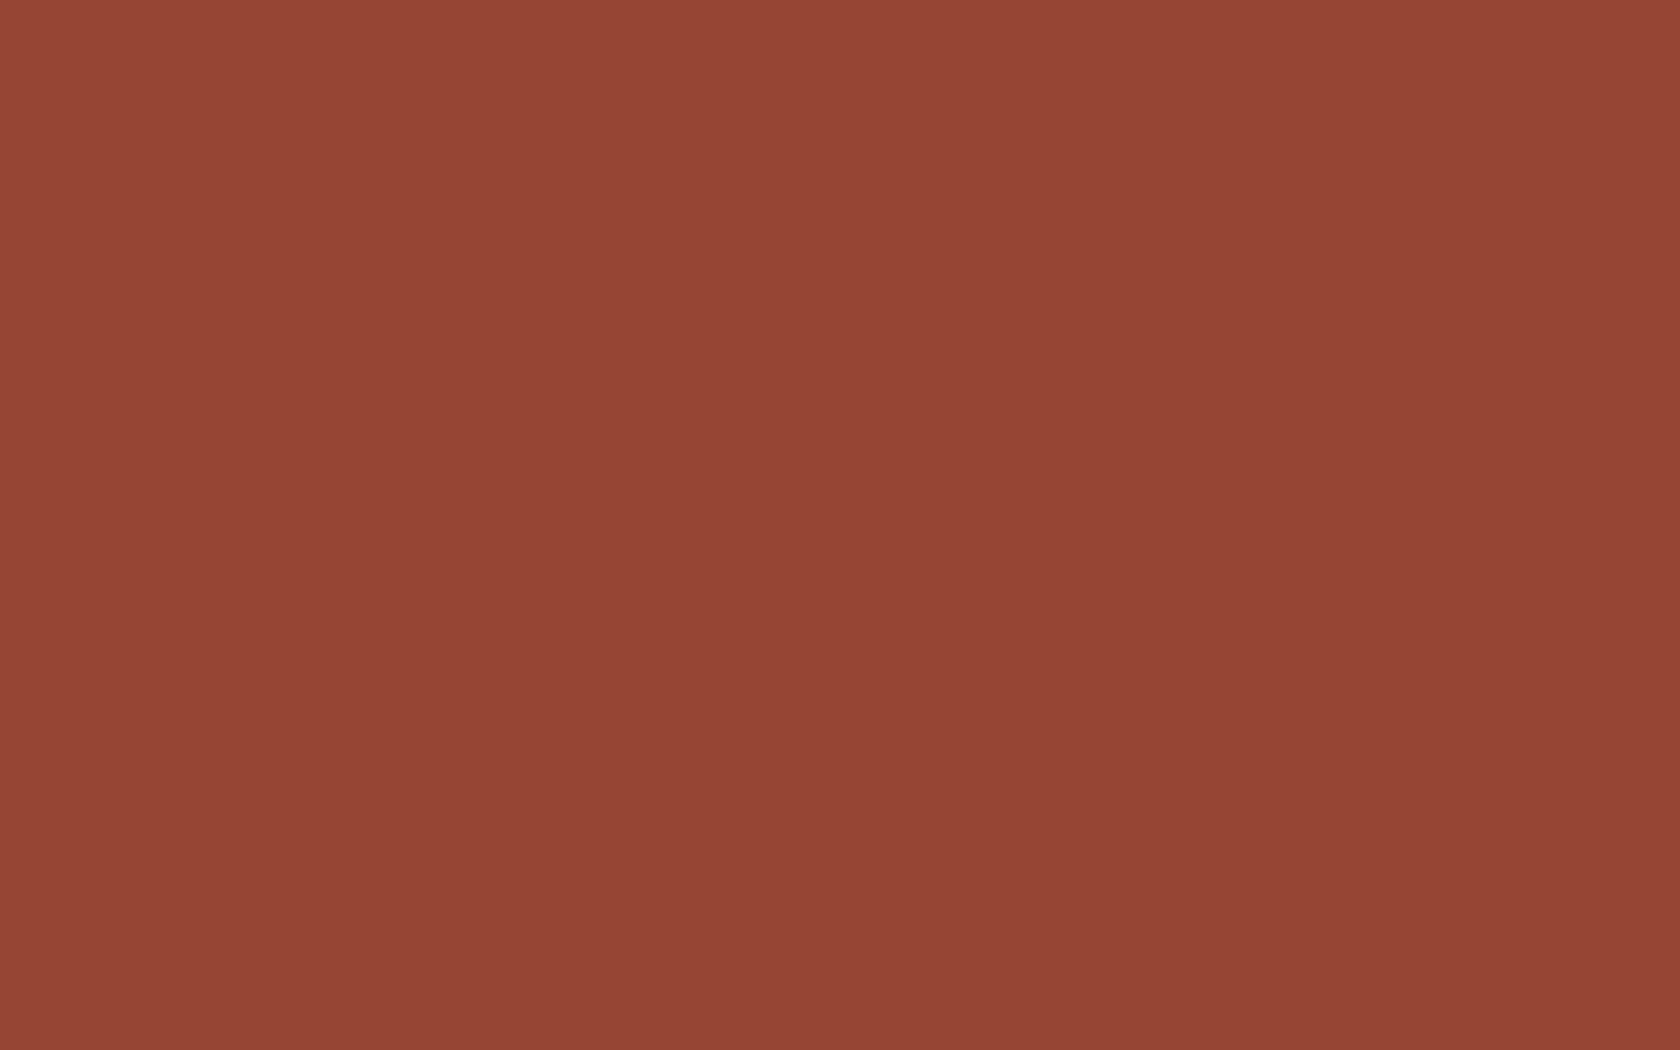 1680x1050 Chestnut Solid Color Background